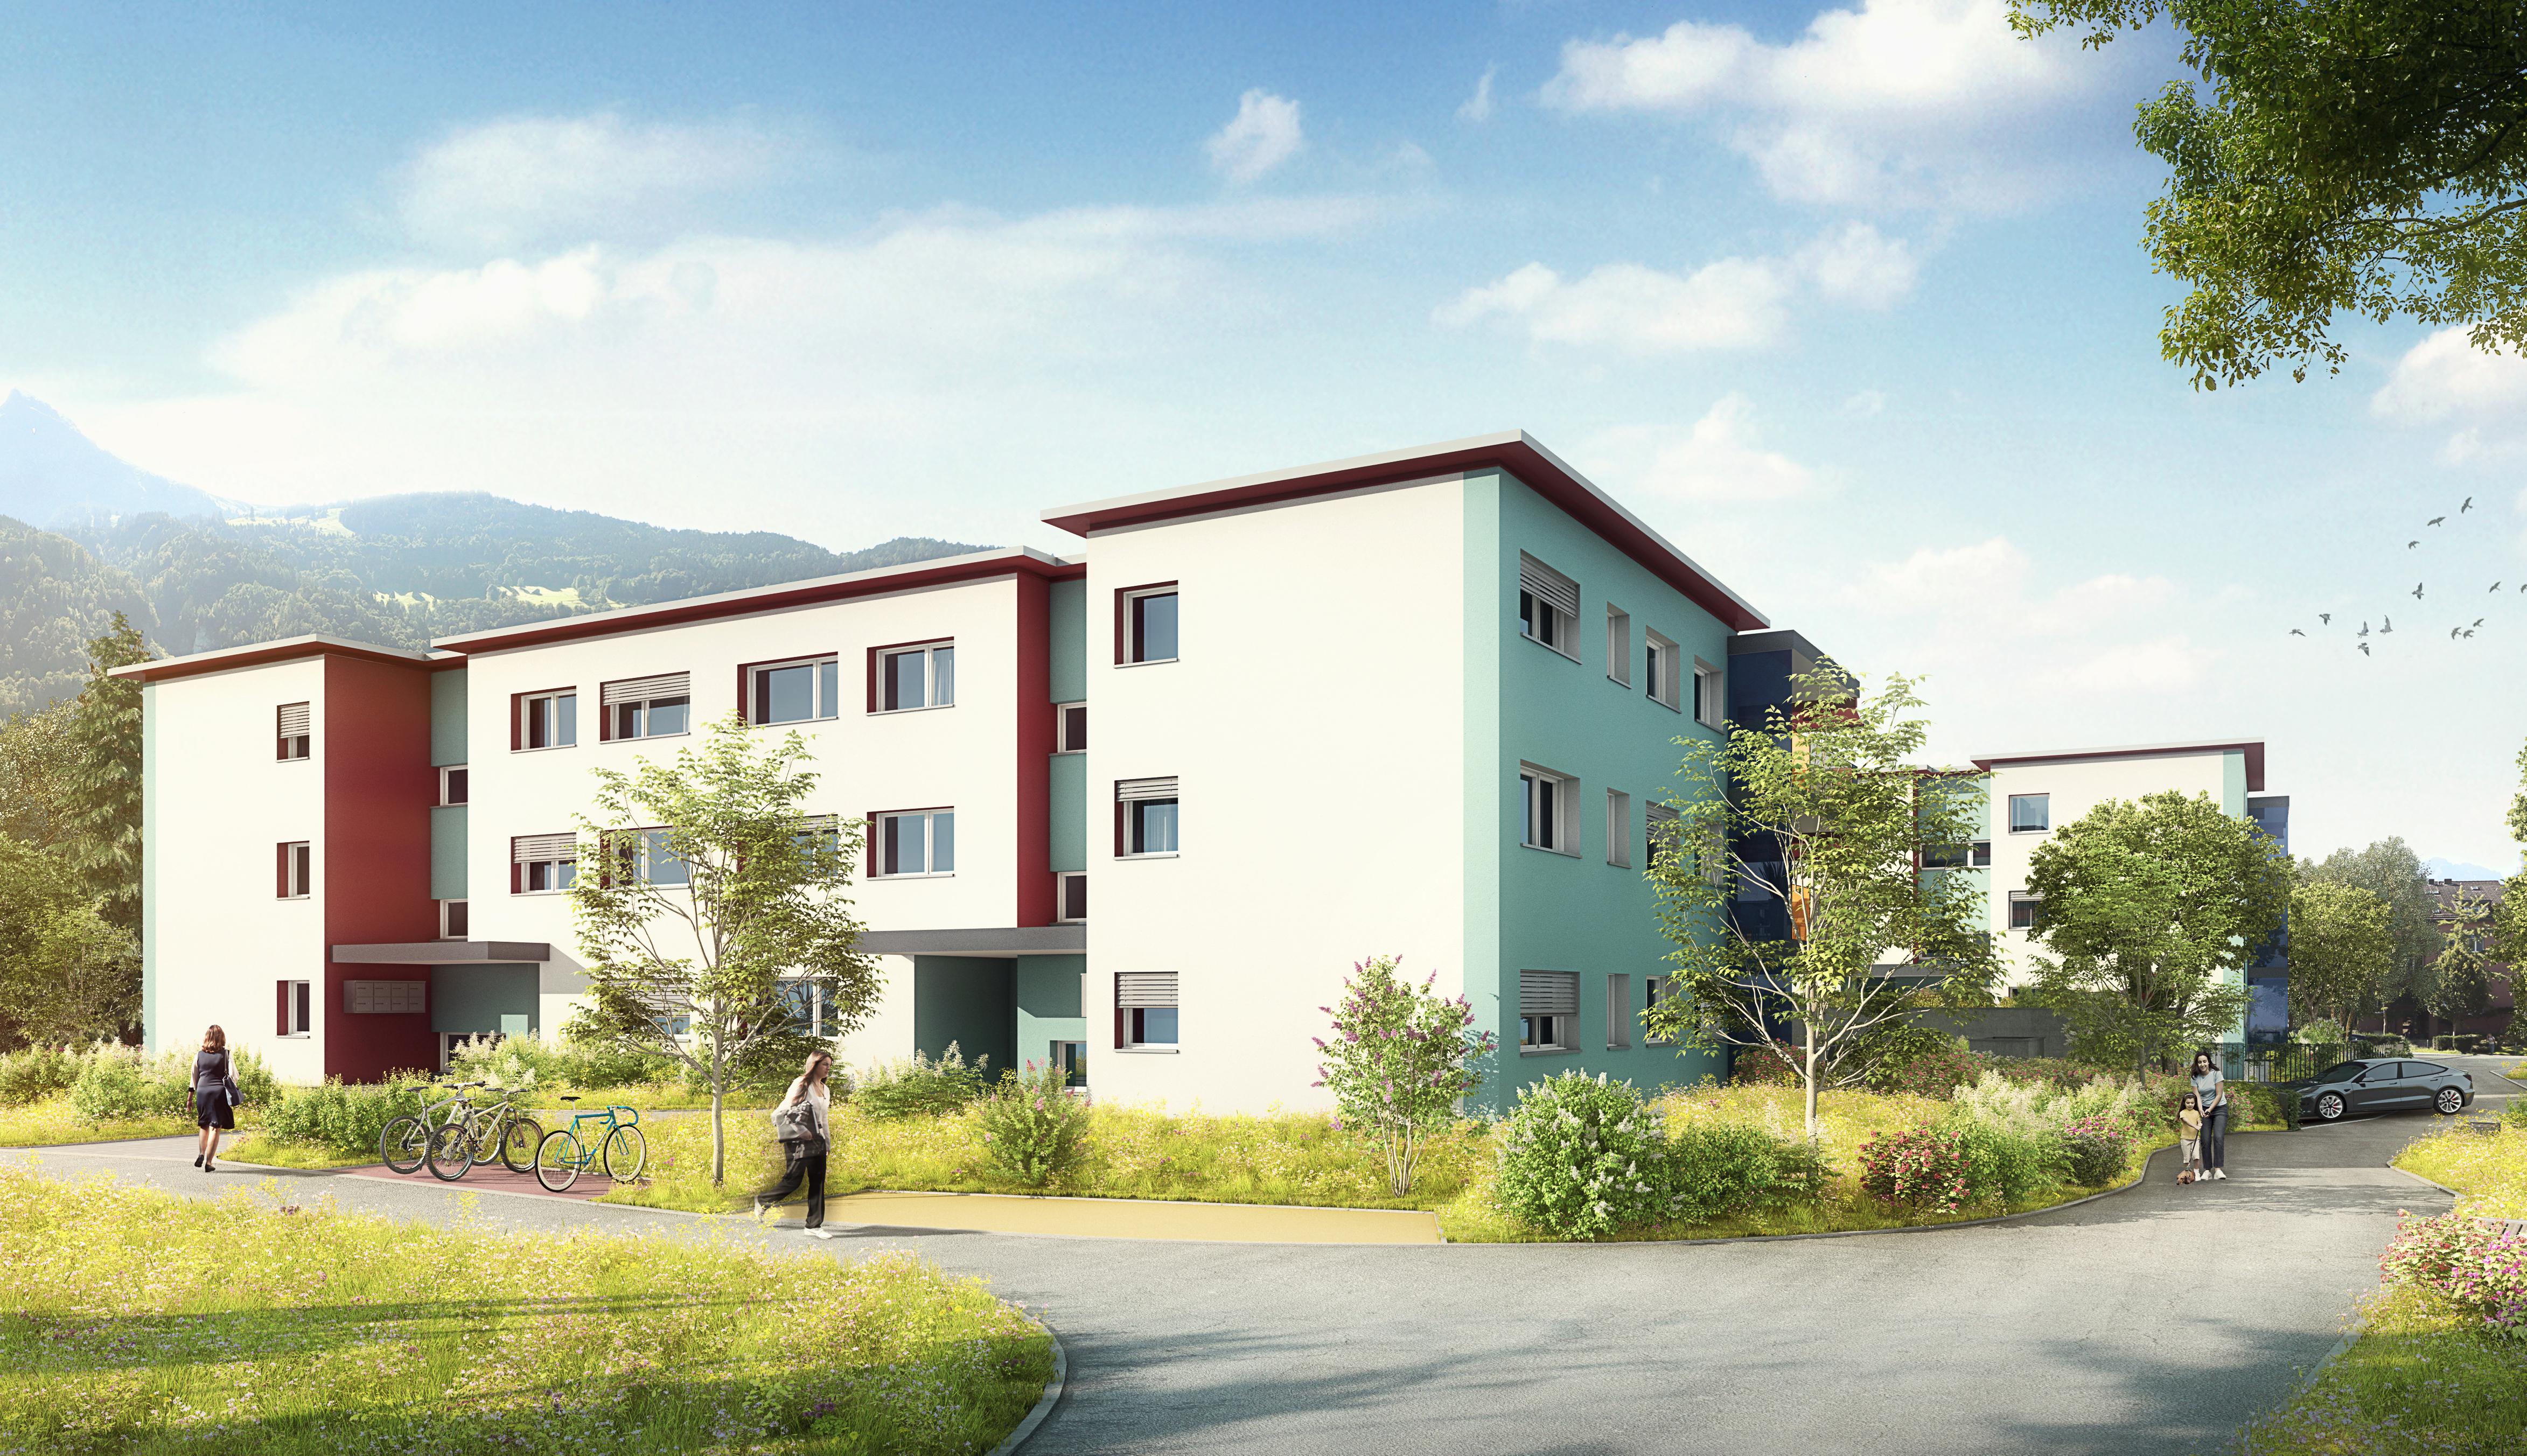 Rüteli Mollis Wohnüberbauung farbig